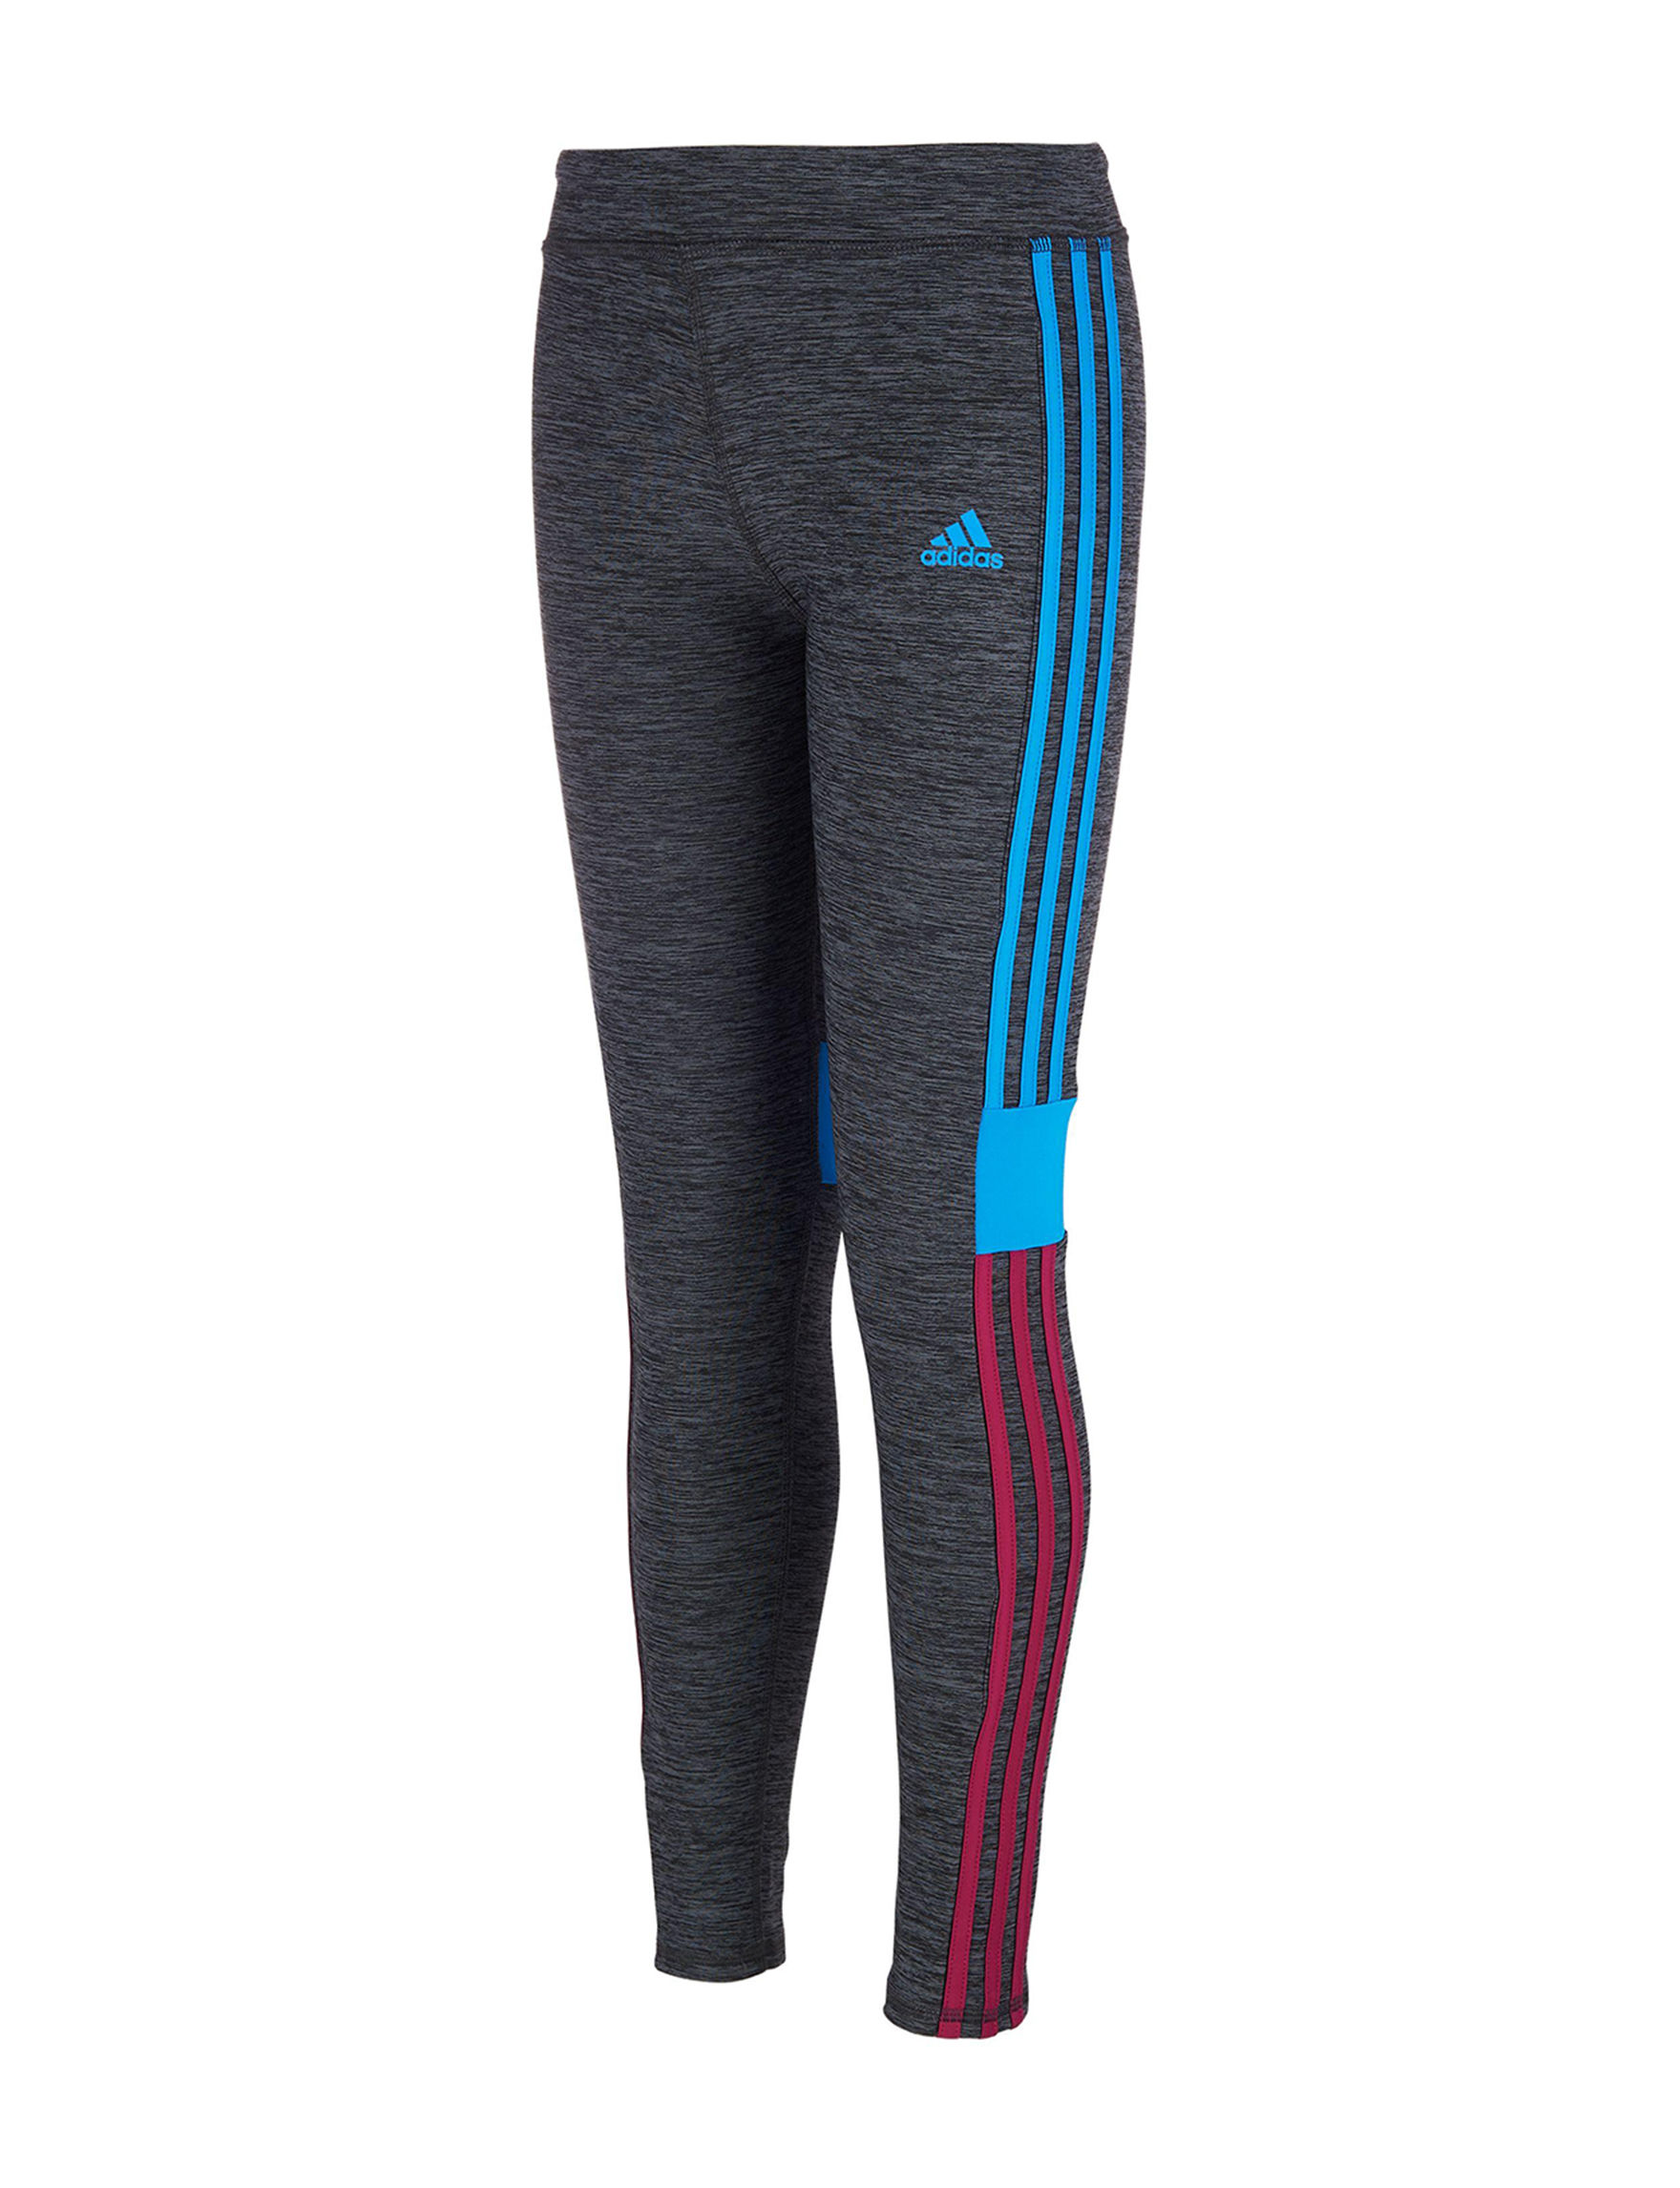 Adidas Heather Black